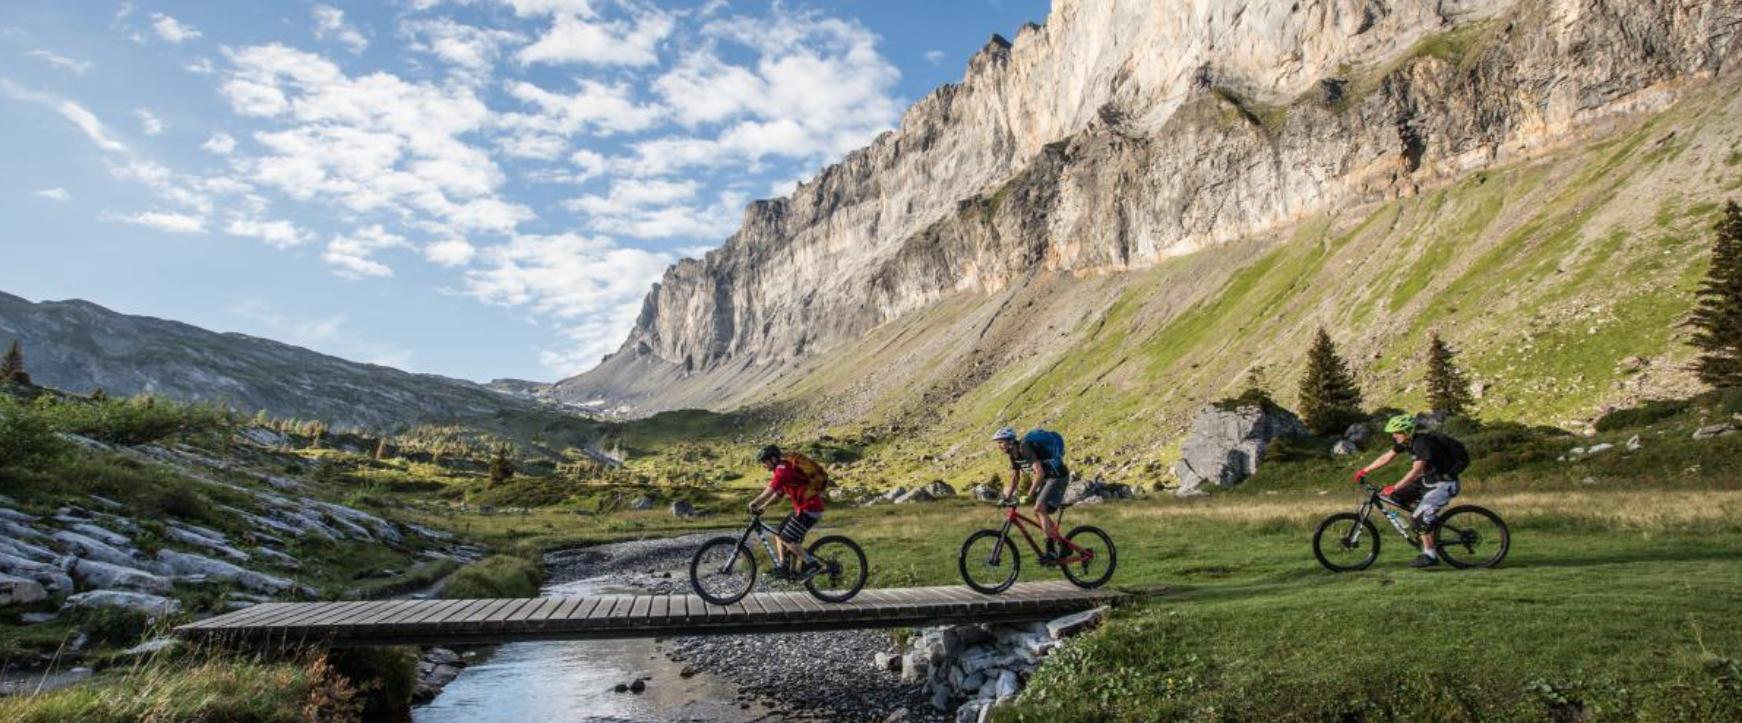 VTT Enduro en vallée de Chamonix avec guide privé